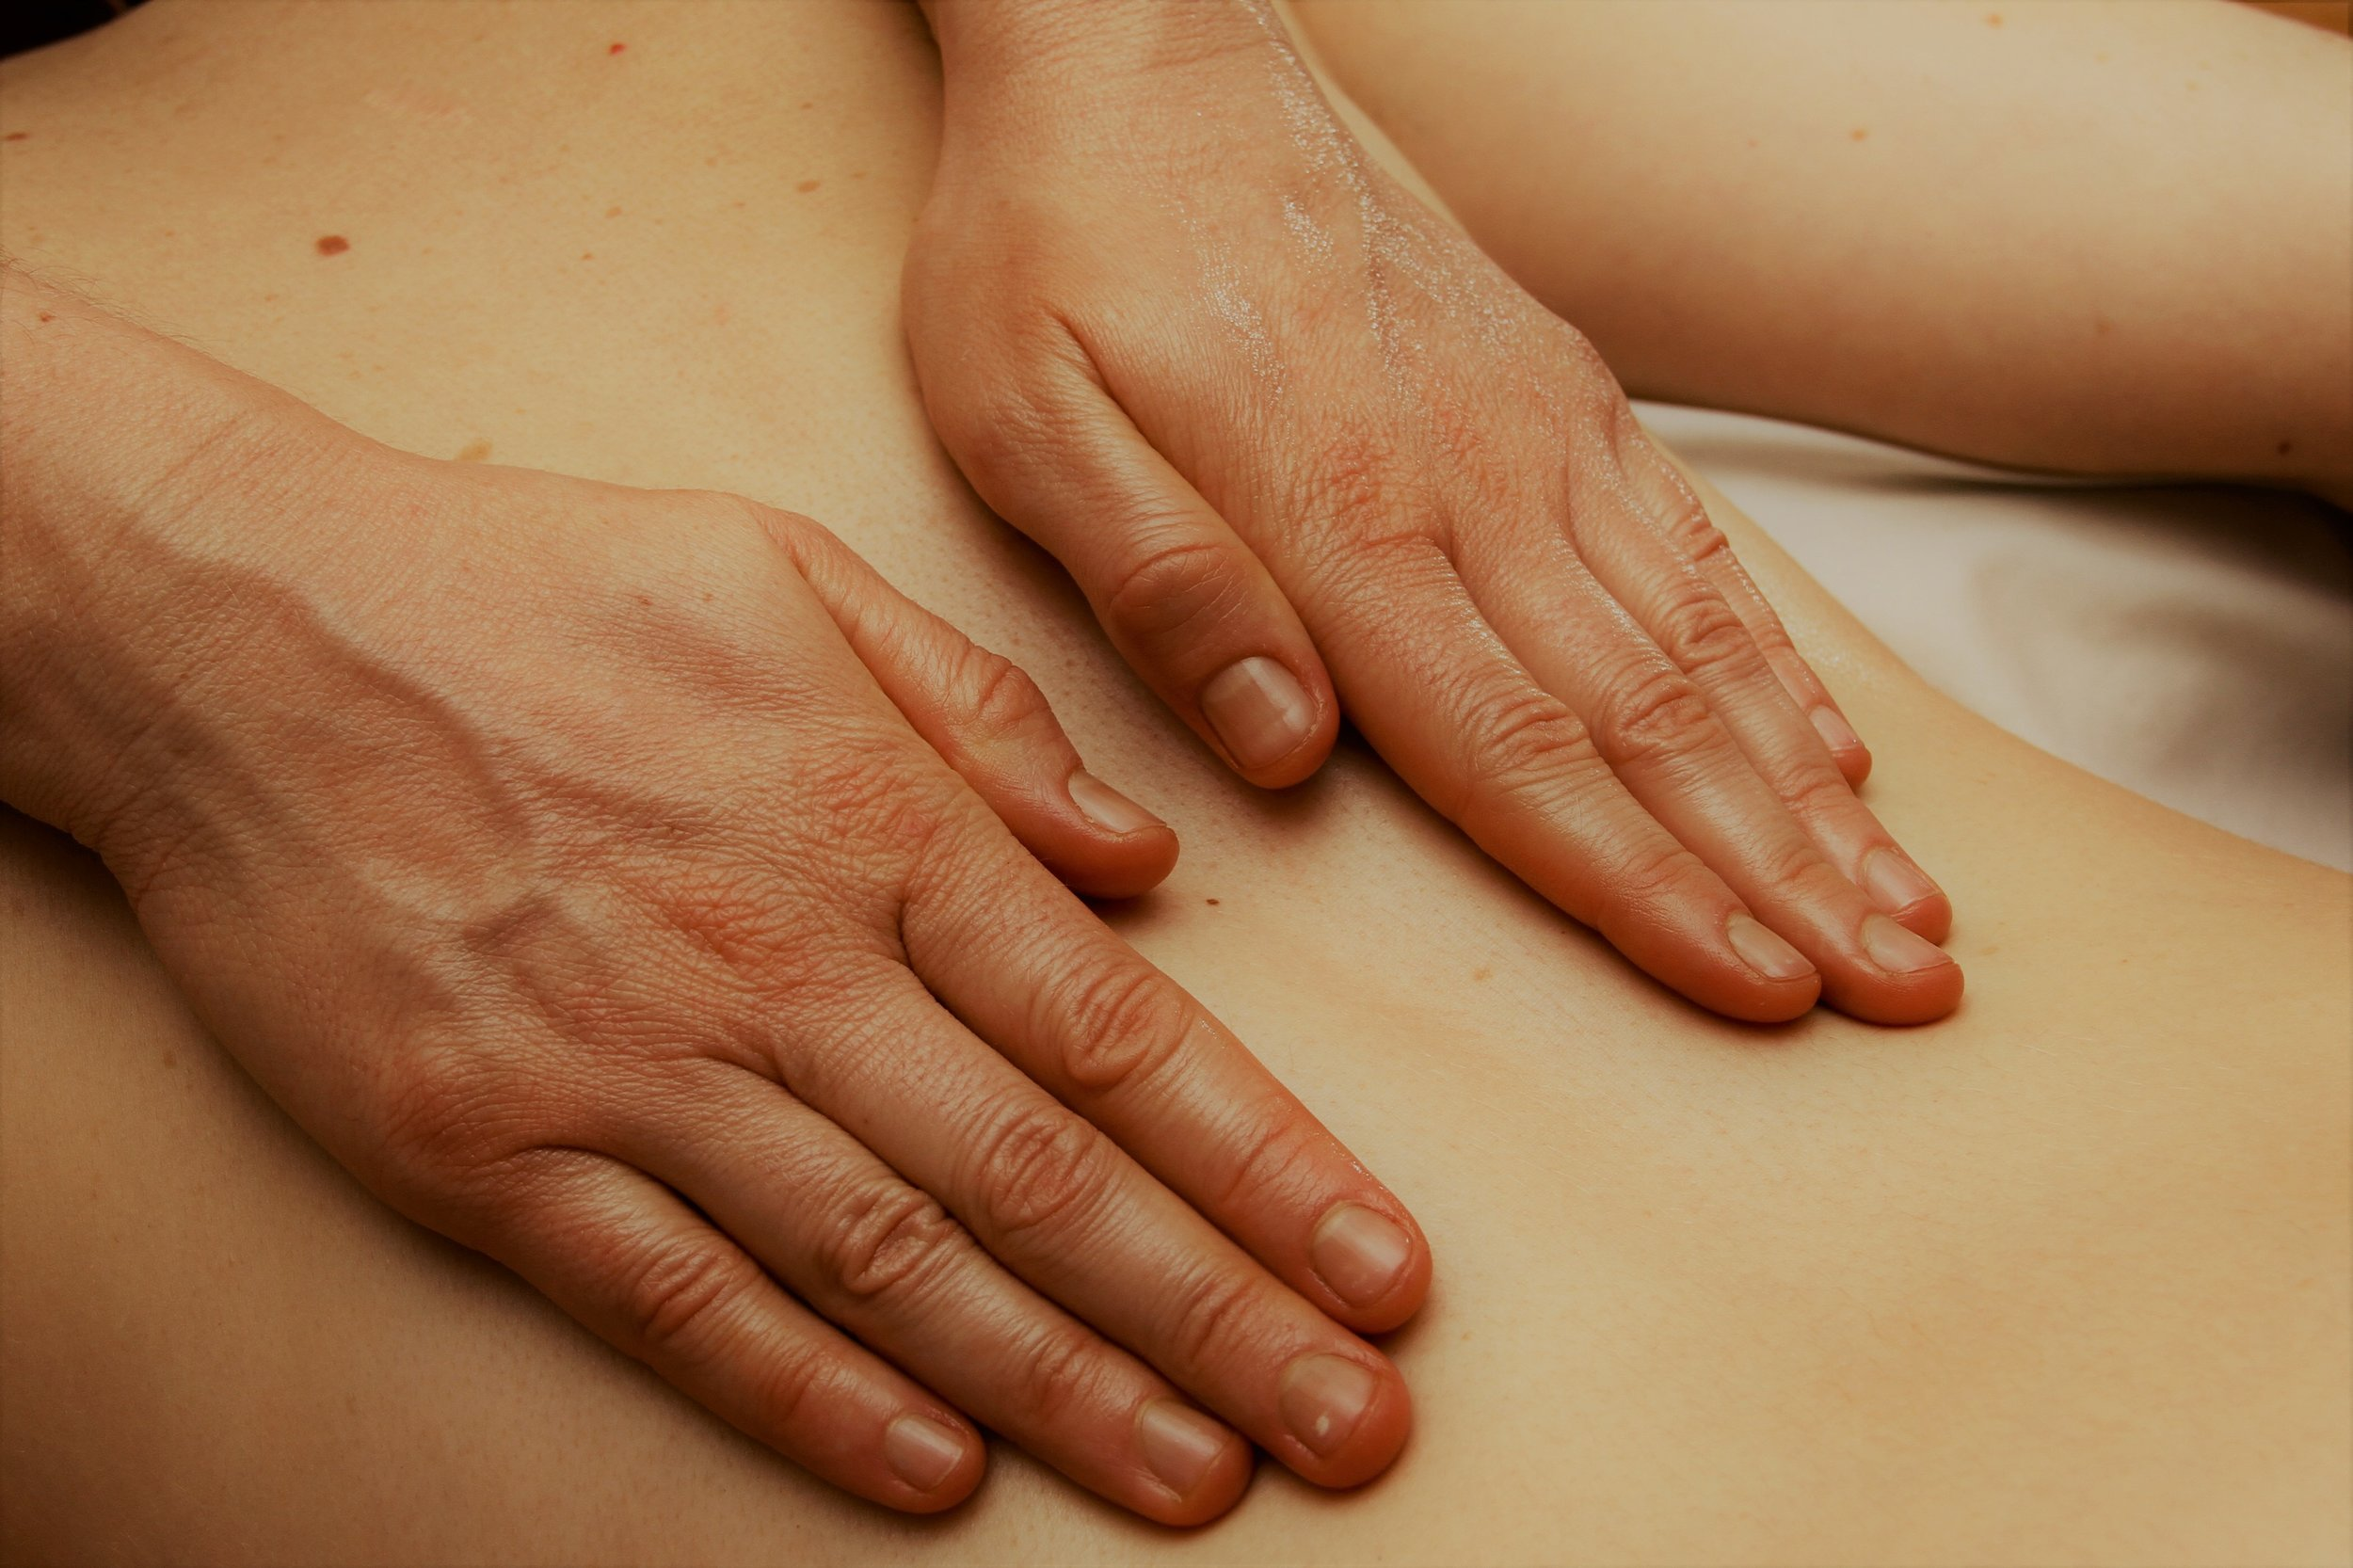 massage cropped.jpg